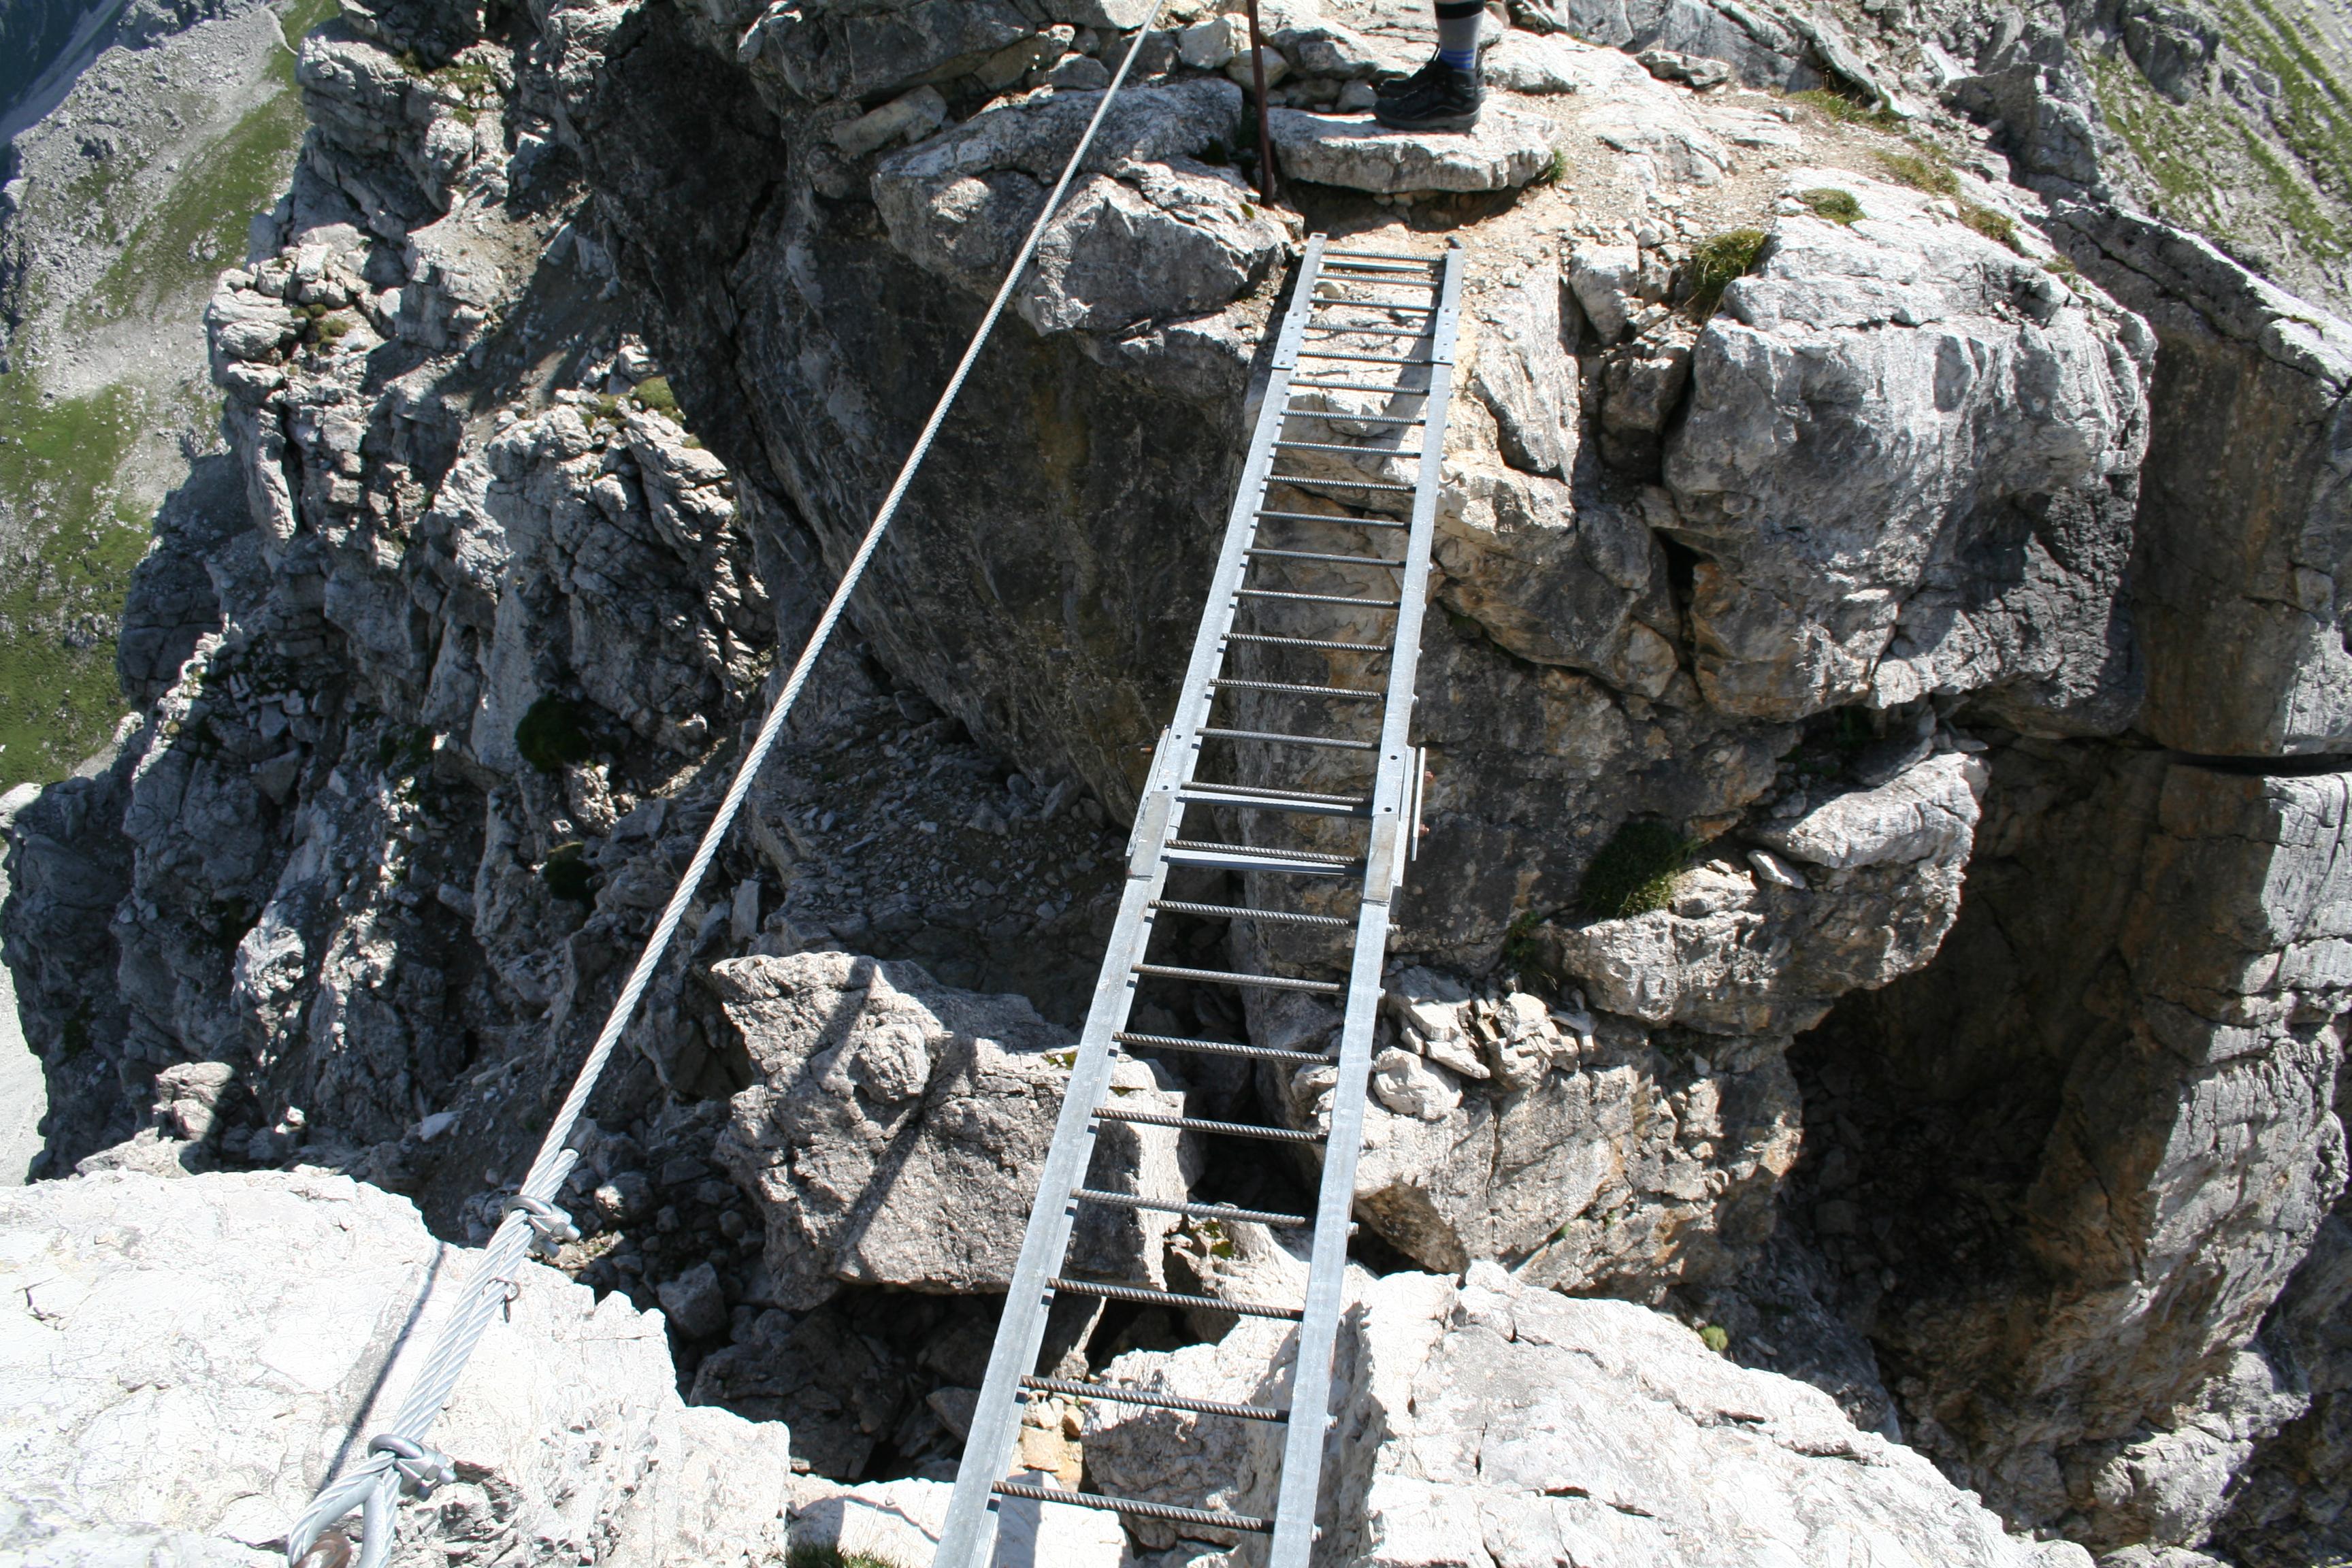 Klettersteig Mindelheimer : Mindelheimer klettersteig go and travel